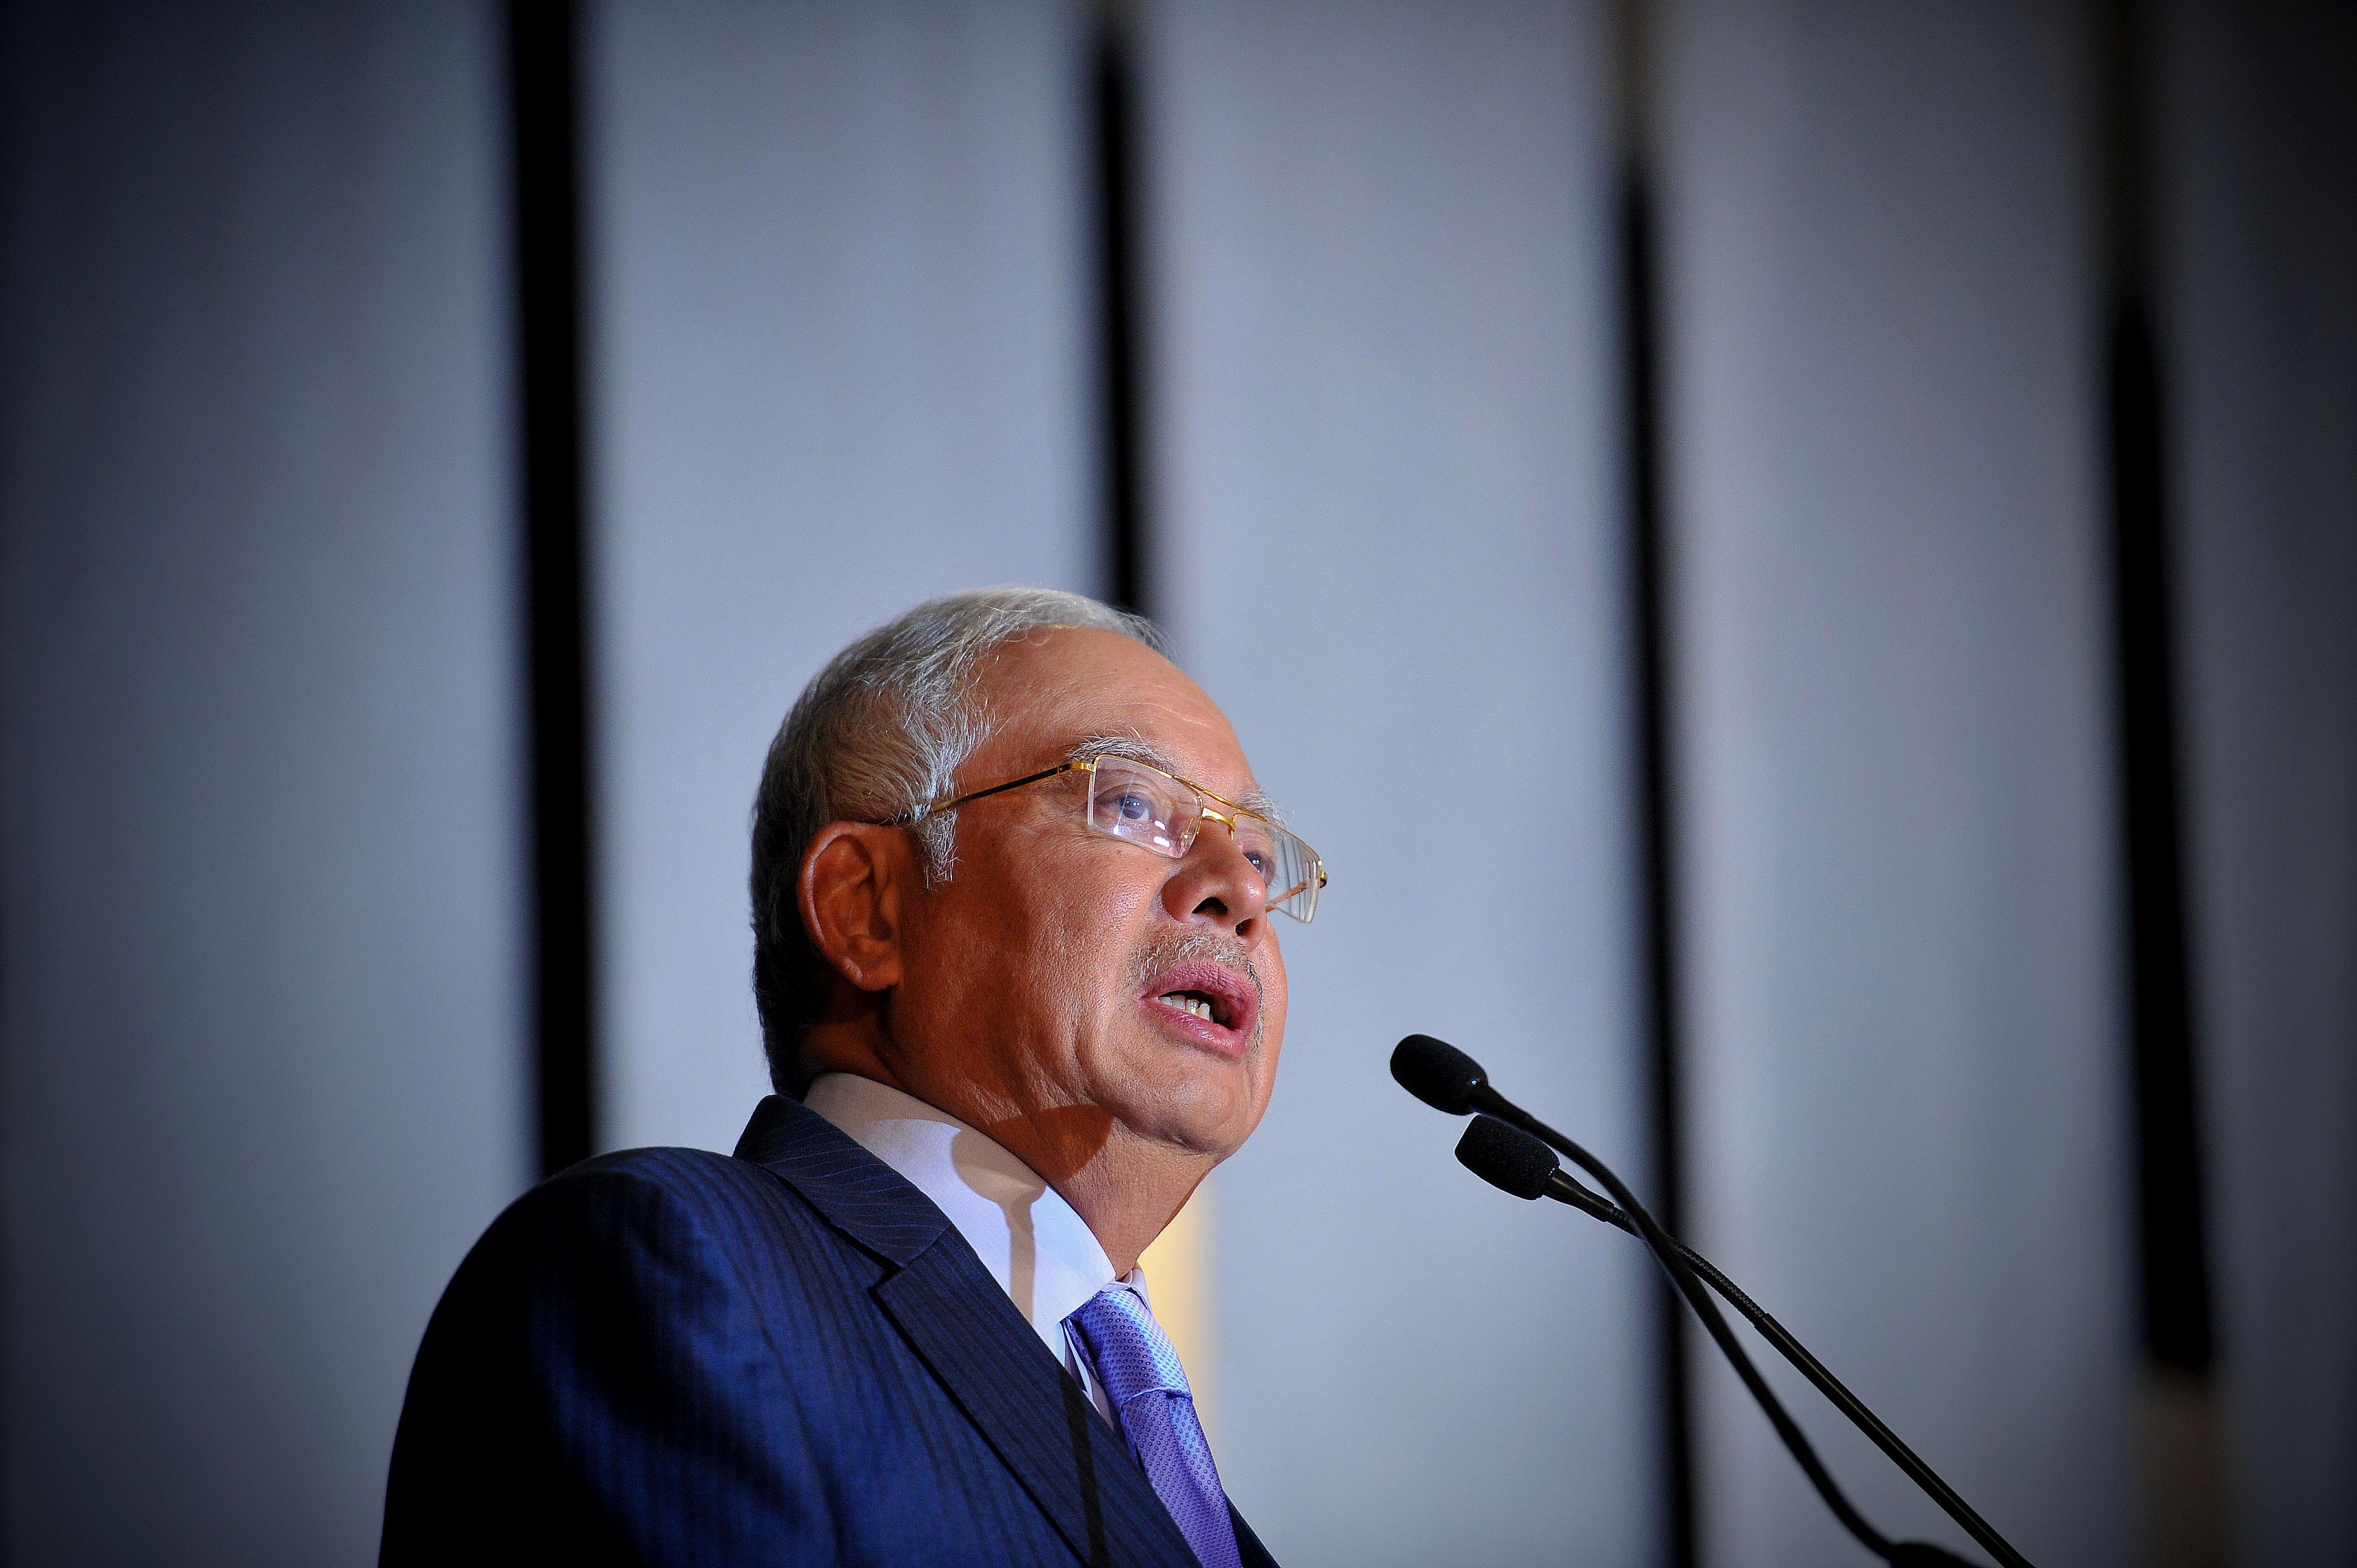 former Malaysian Prime Minister Datuk Seri Najib Razak